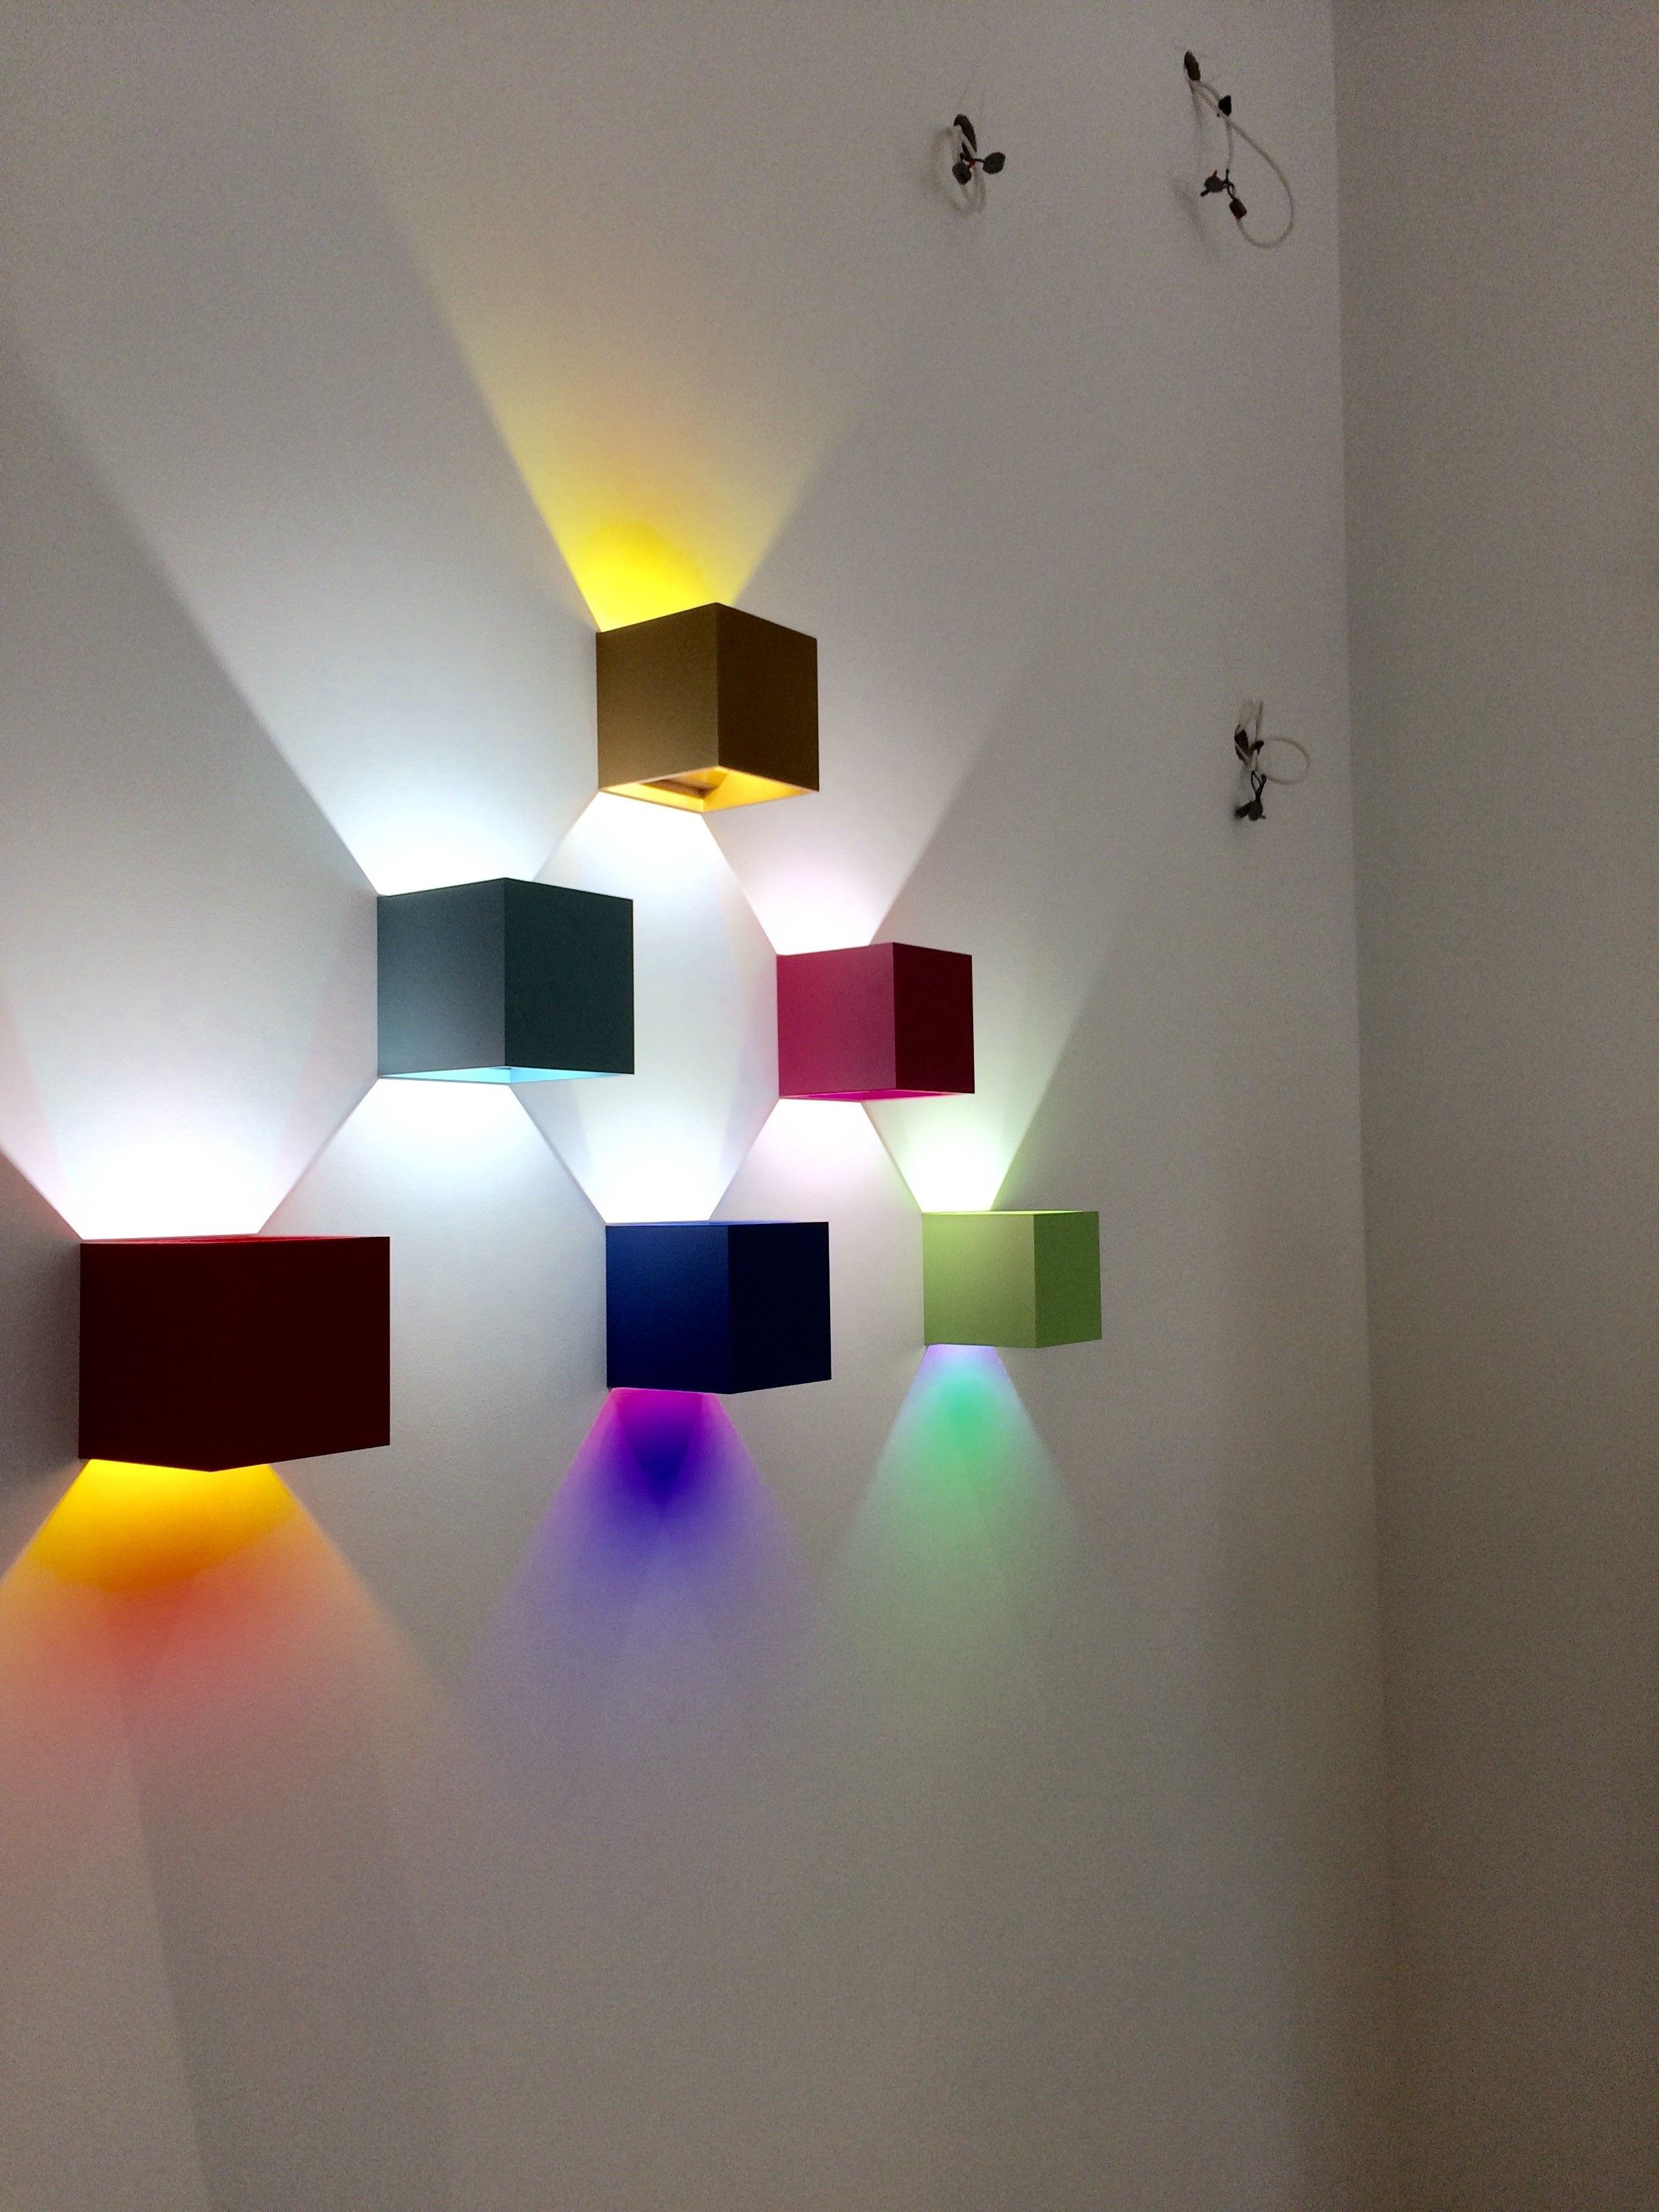 Sphere Stem Sconce Single Antique Brass Sconce Lighting Sconces Wall Lights